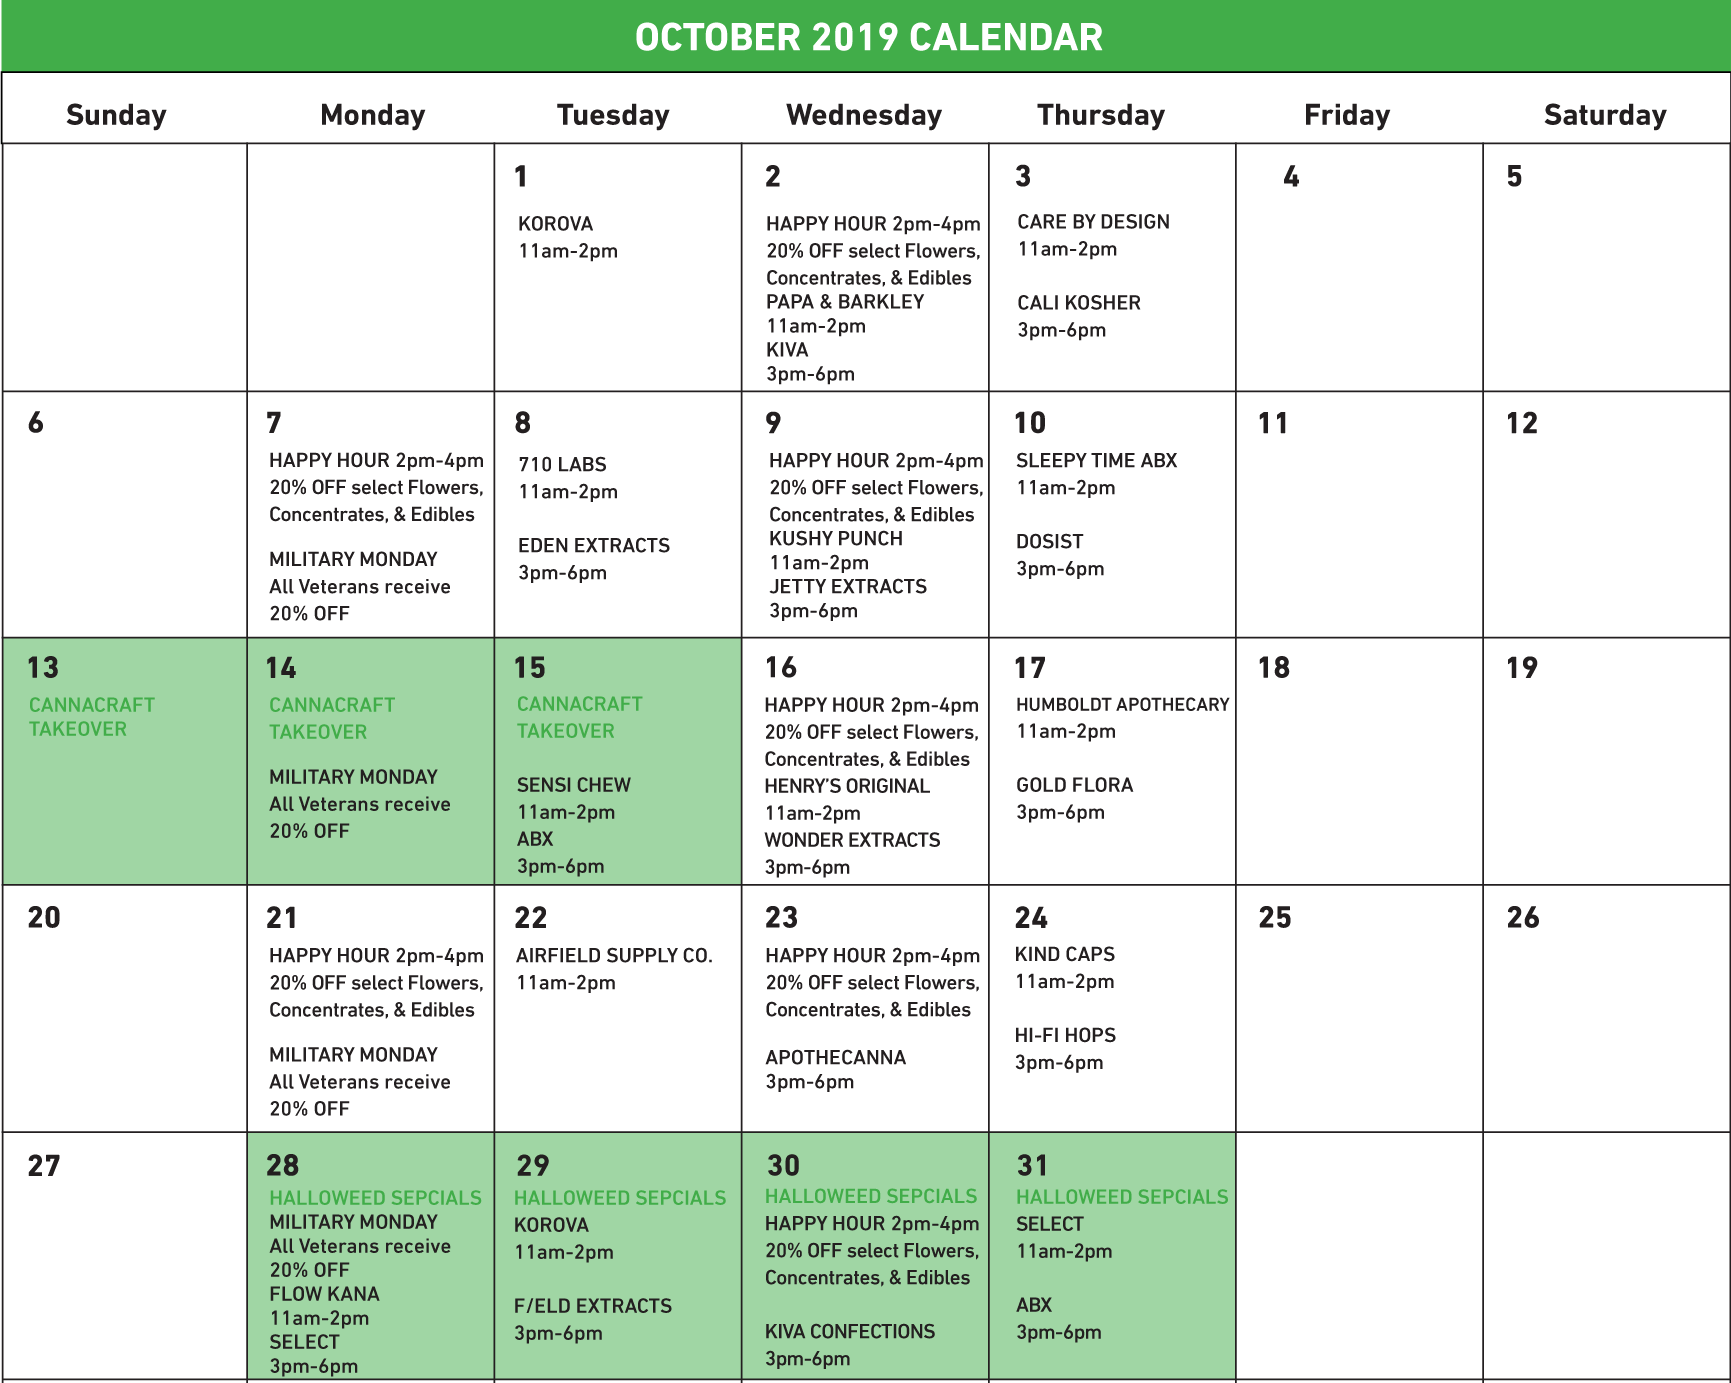 OctoberCalendar2019.png